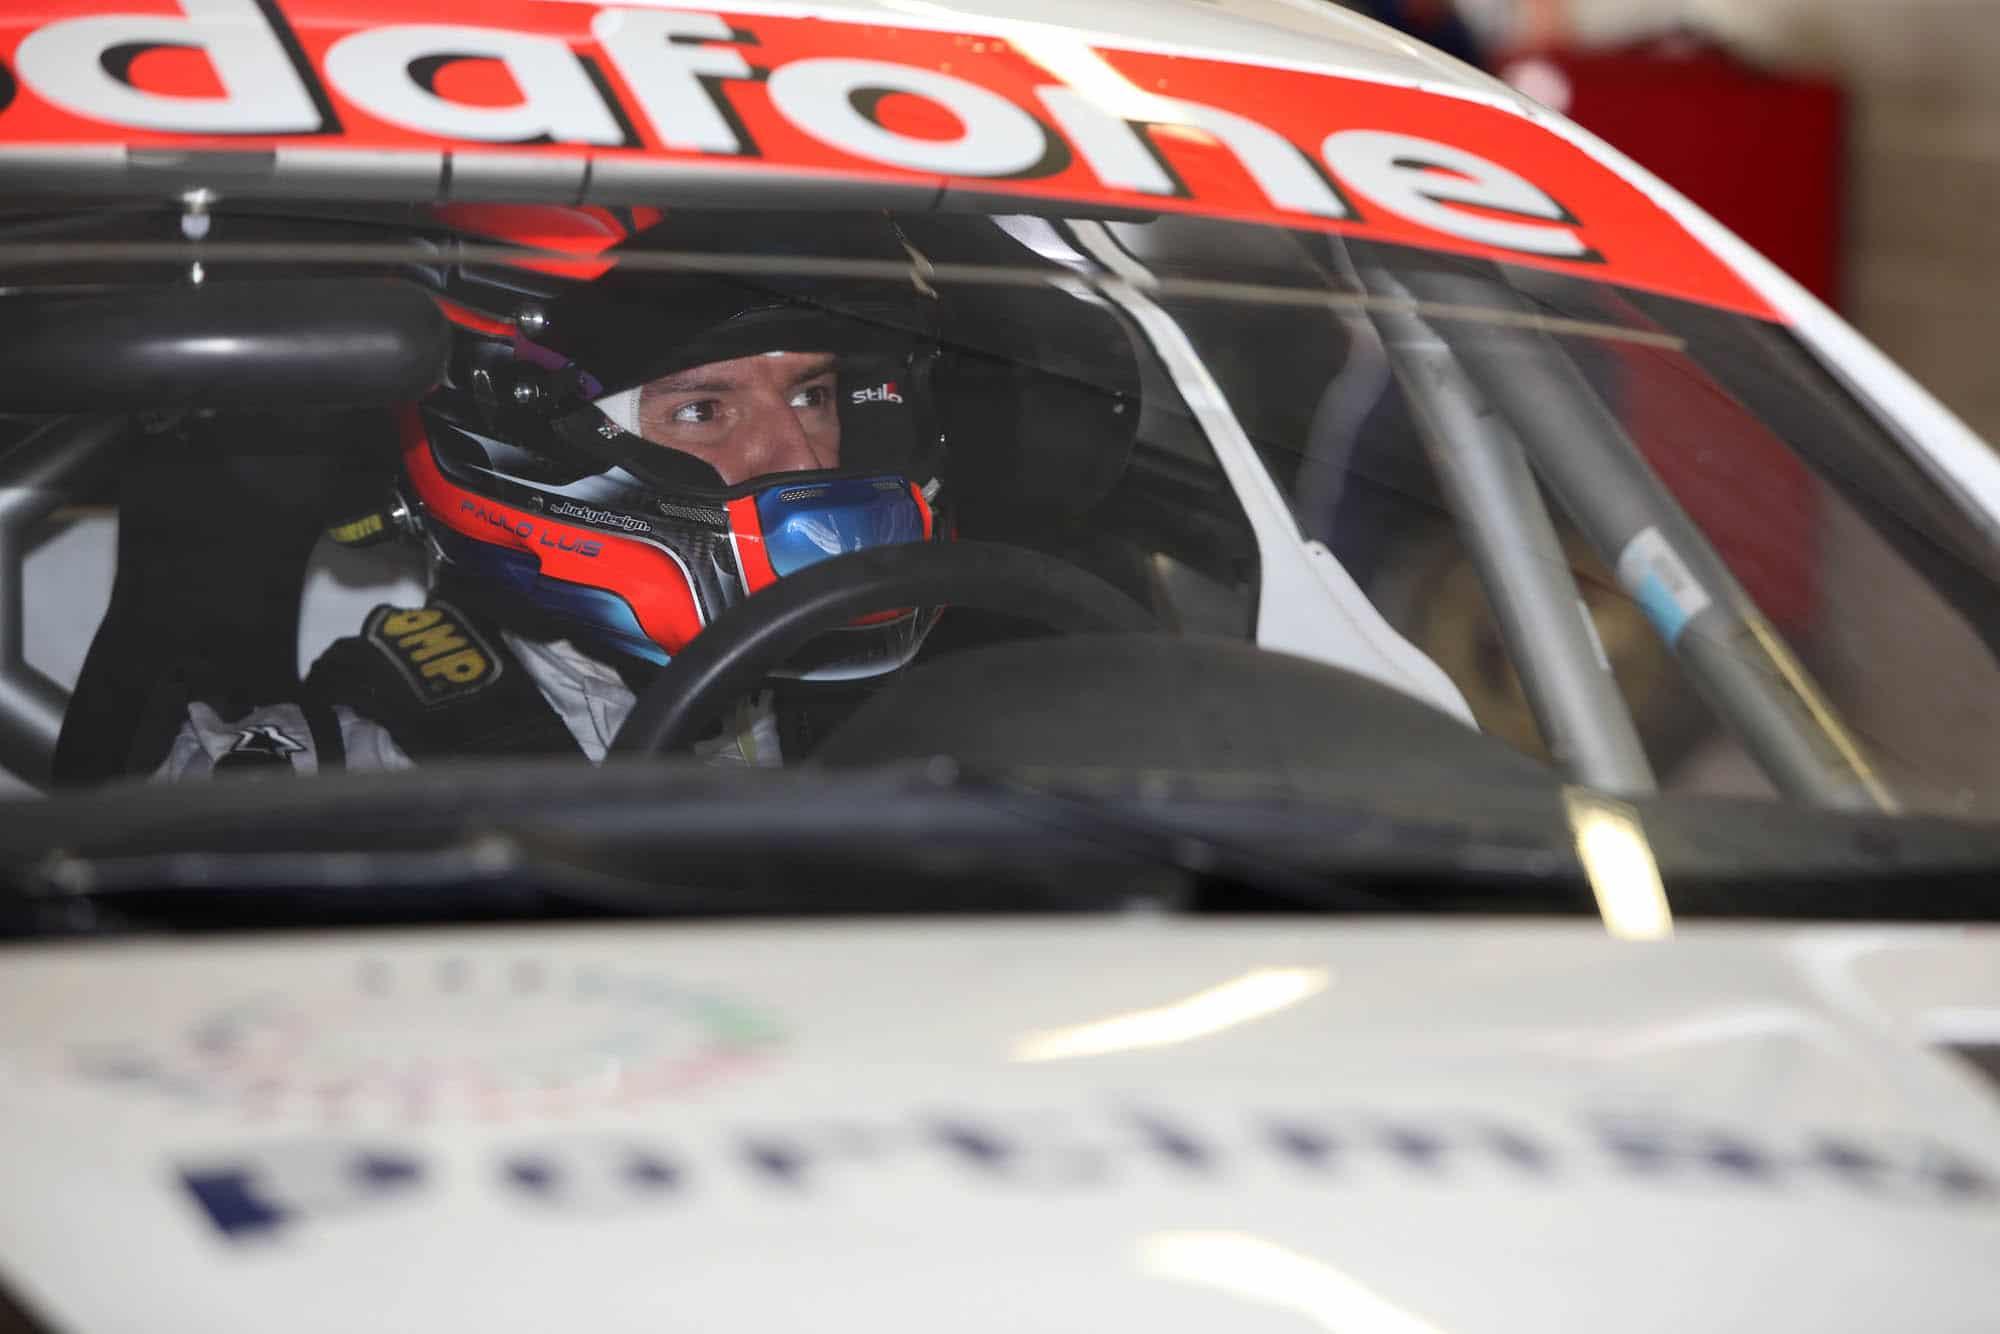 Circuito Algarve : Circuito tt aia u aia u autódromo internacional algarve